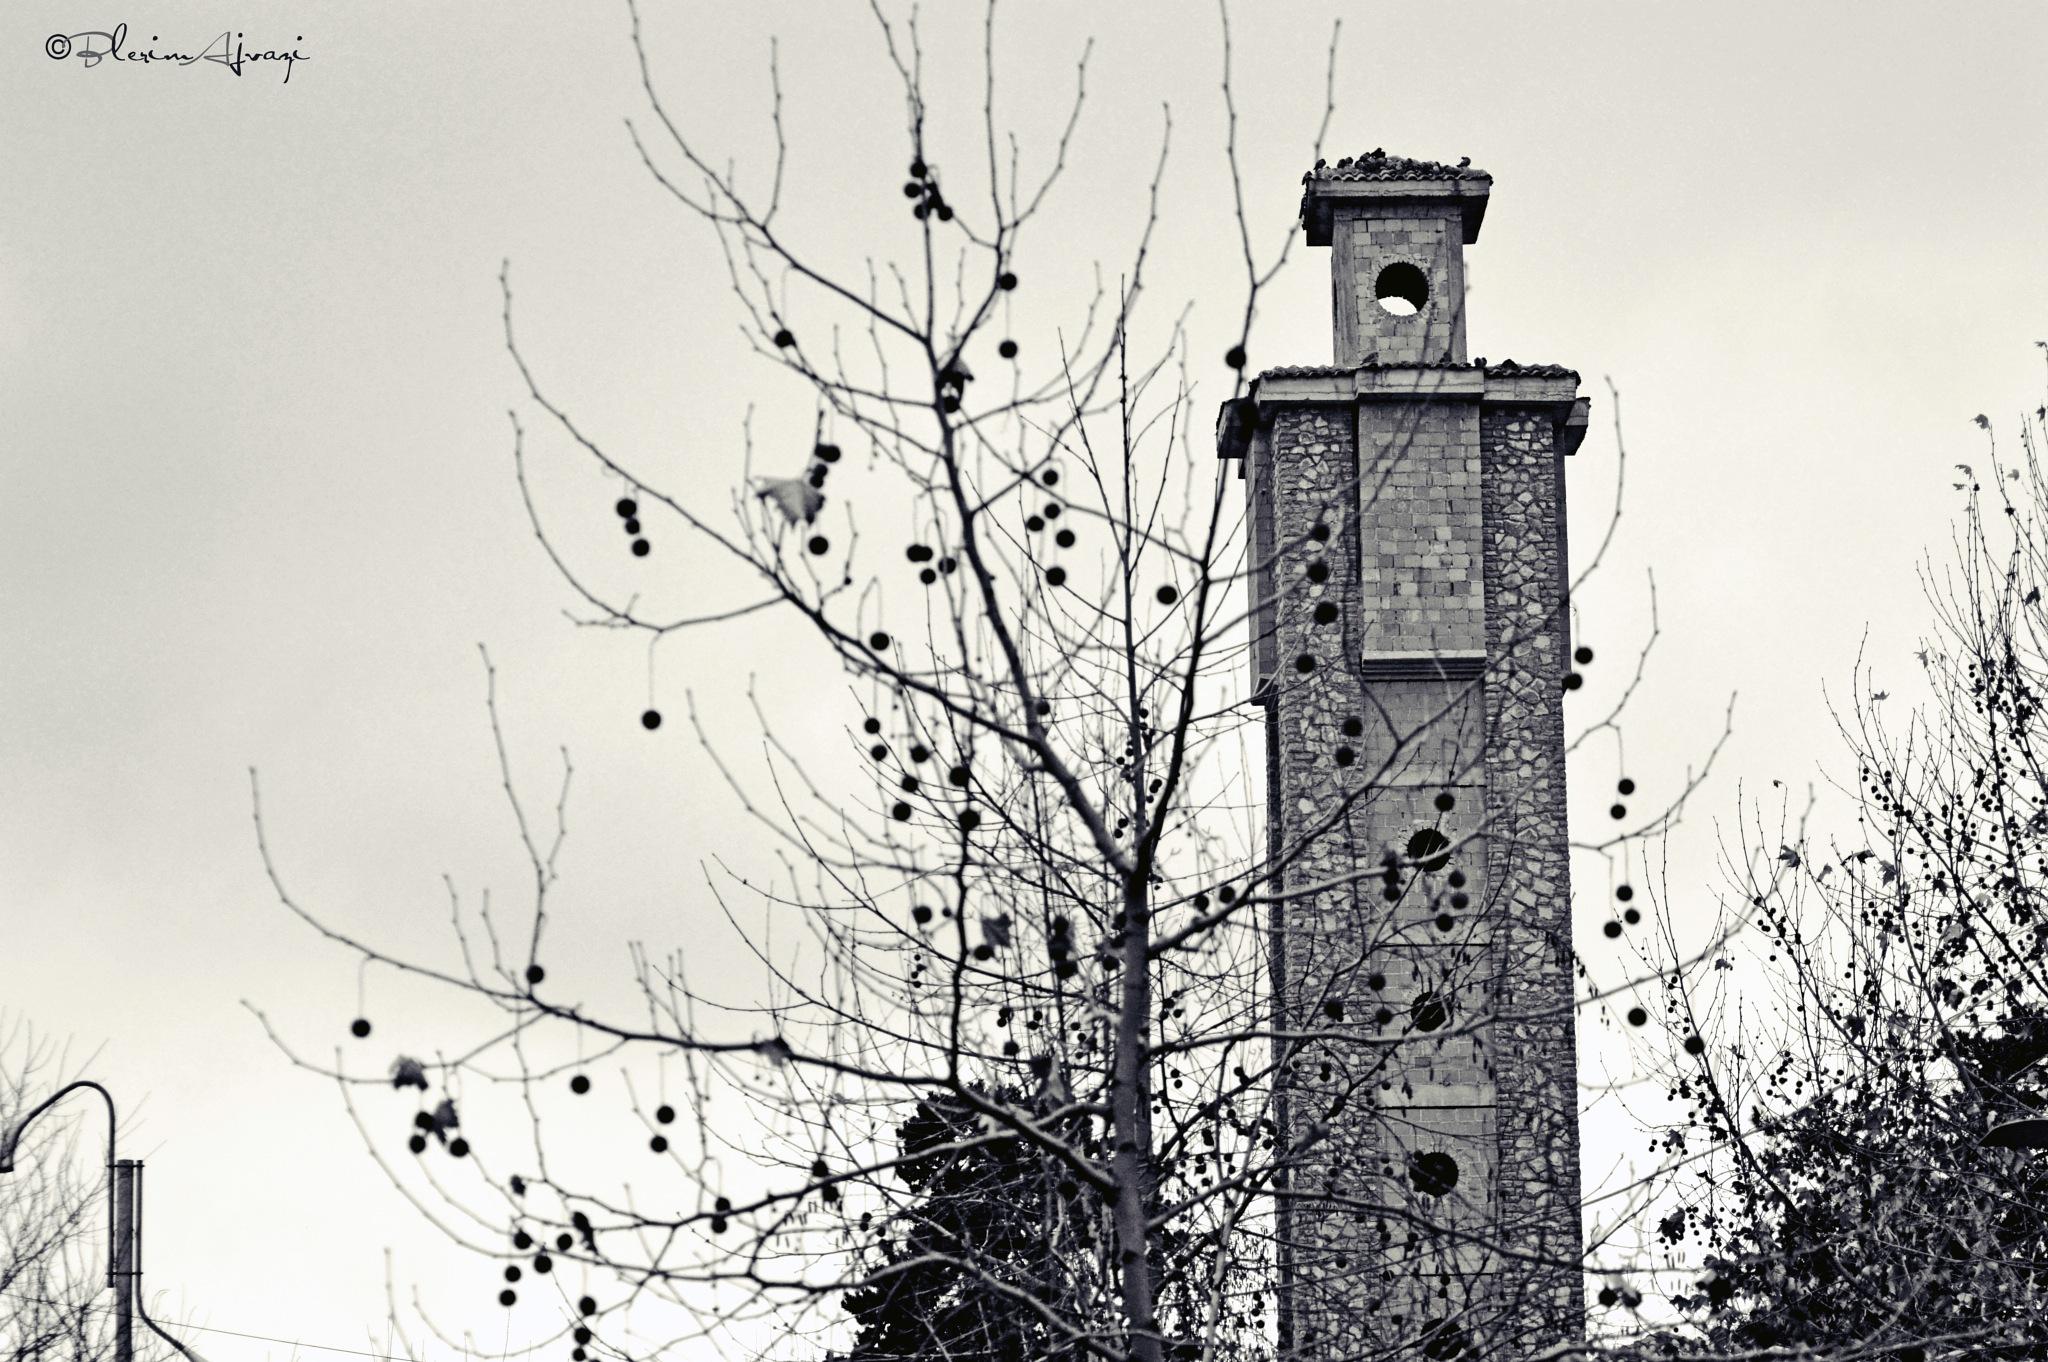 Tower undone by Blerim Ajvazi